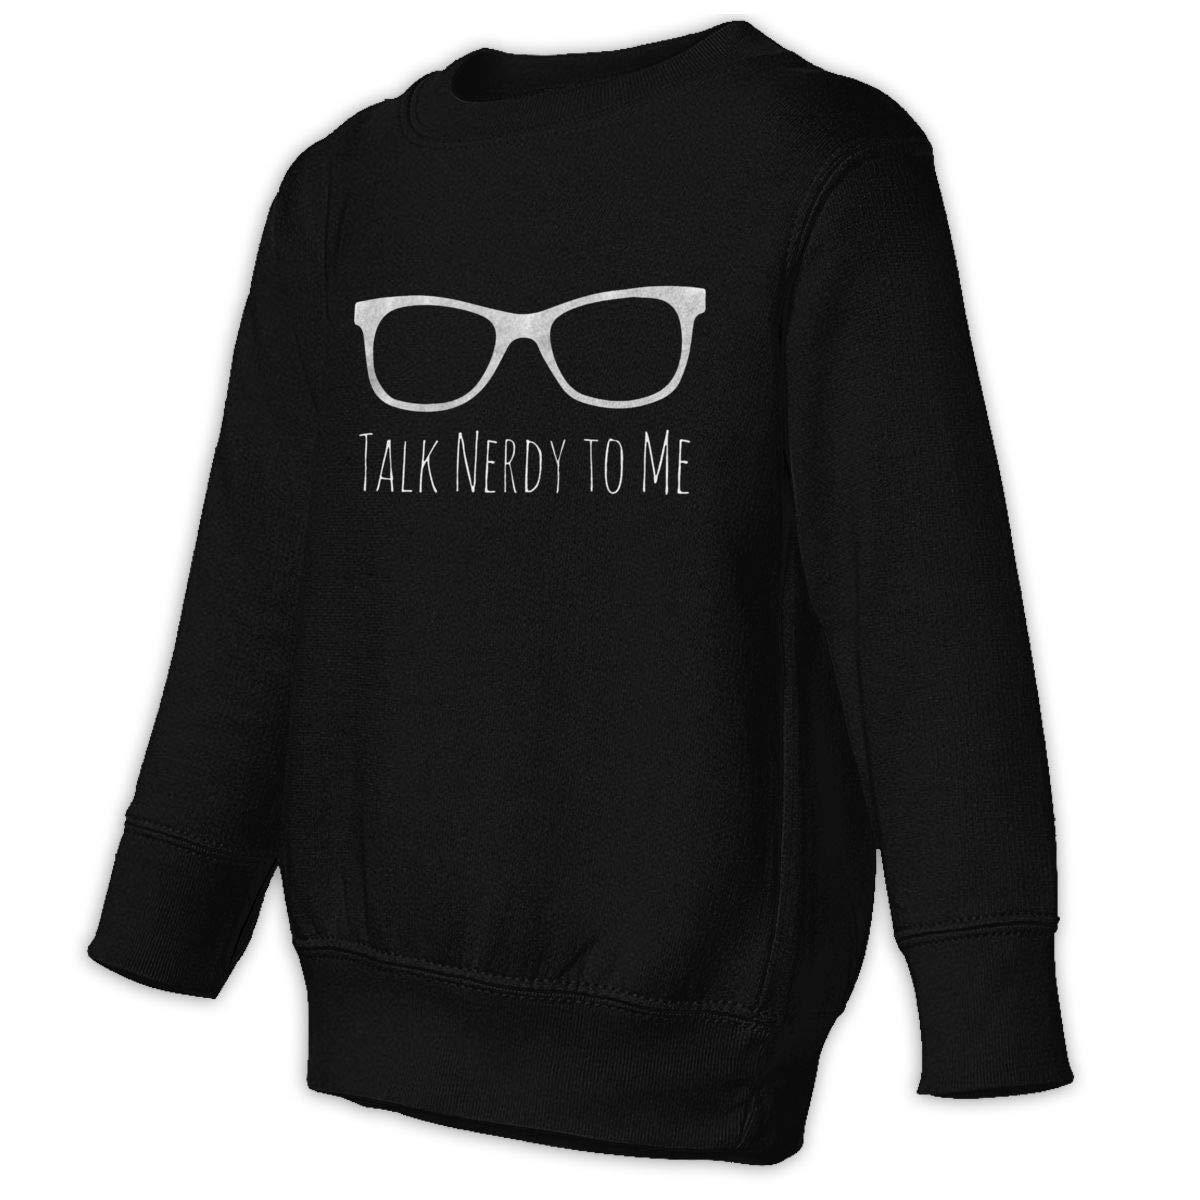 Yuliang Geek Talk Nerdy To Me Children Personality Sweater Black